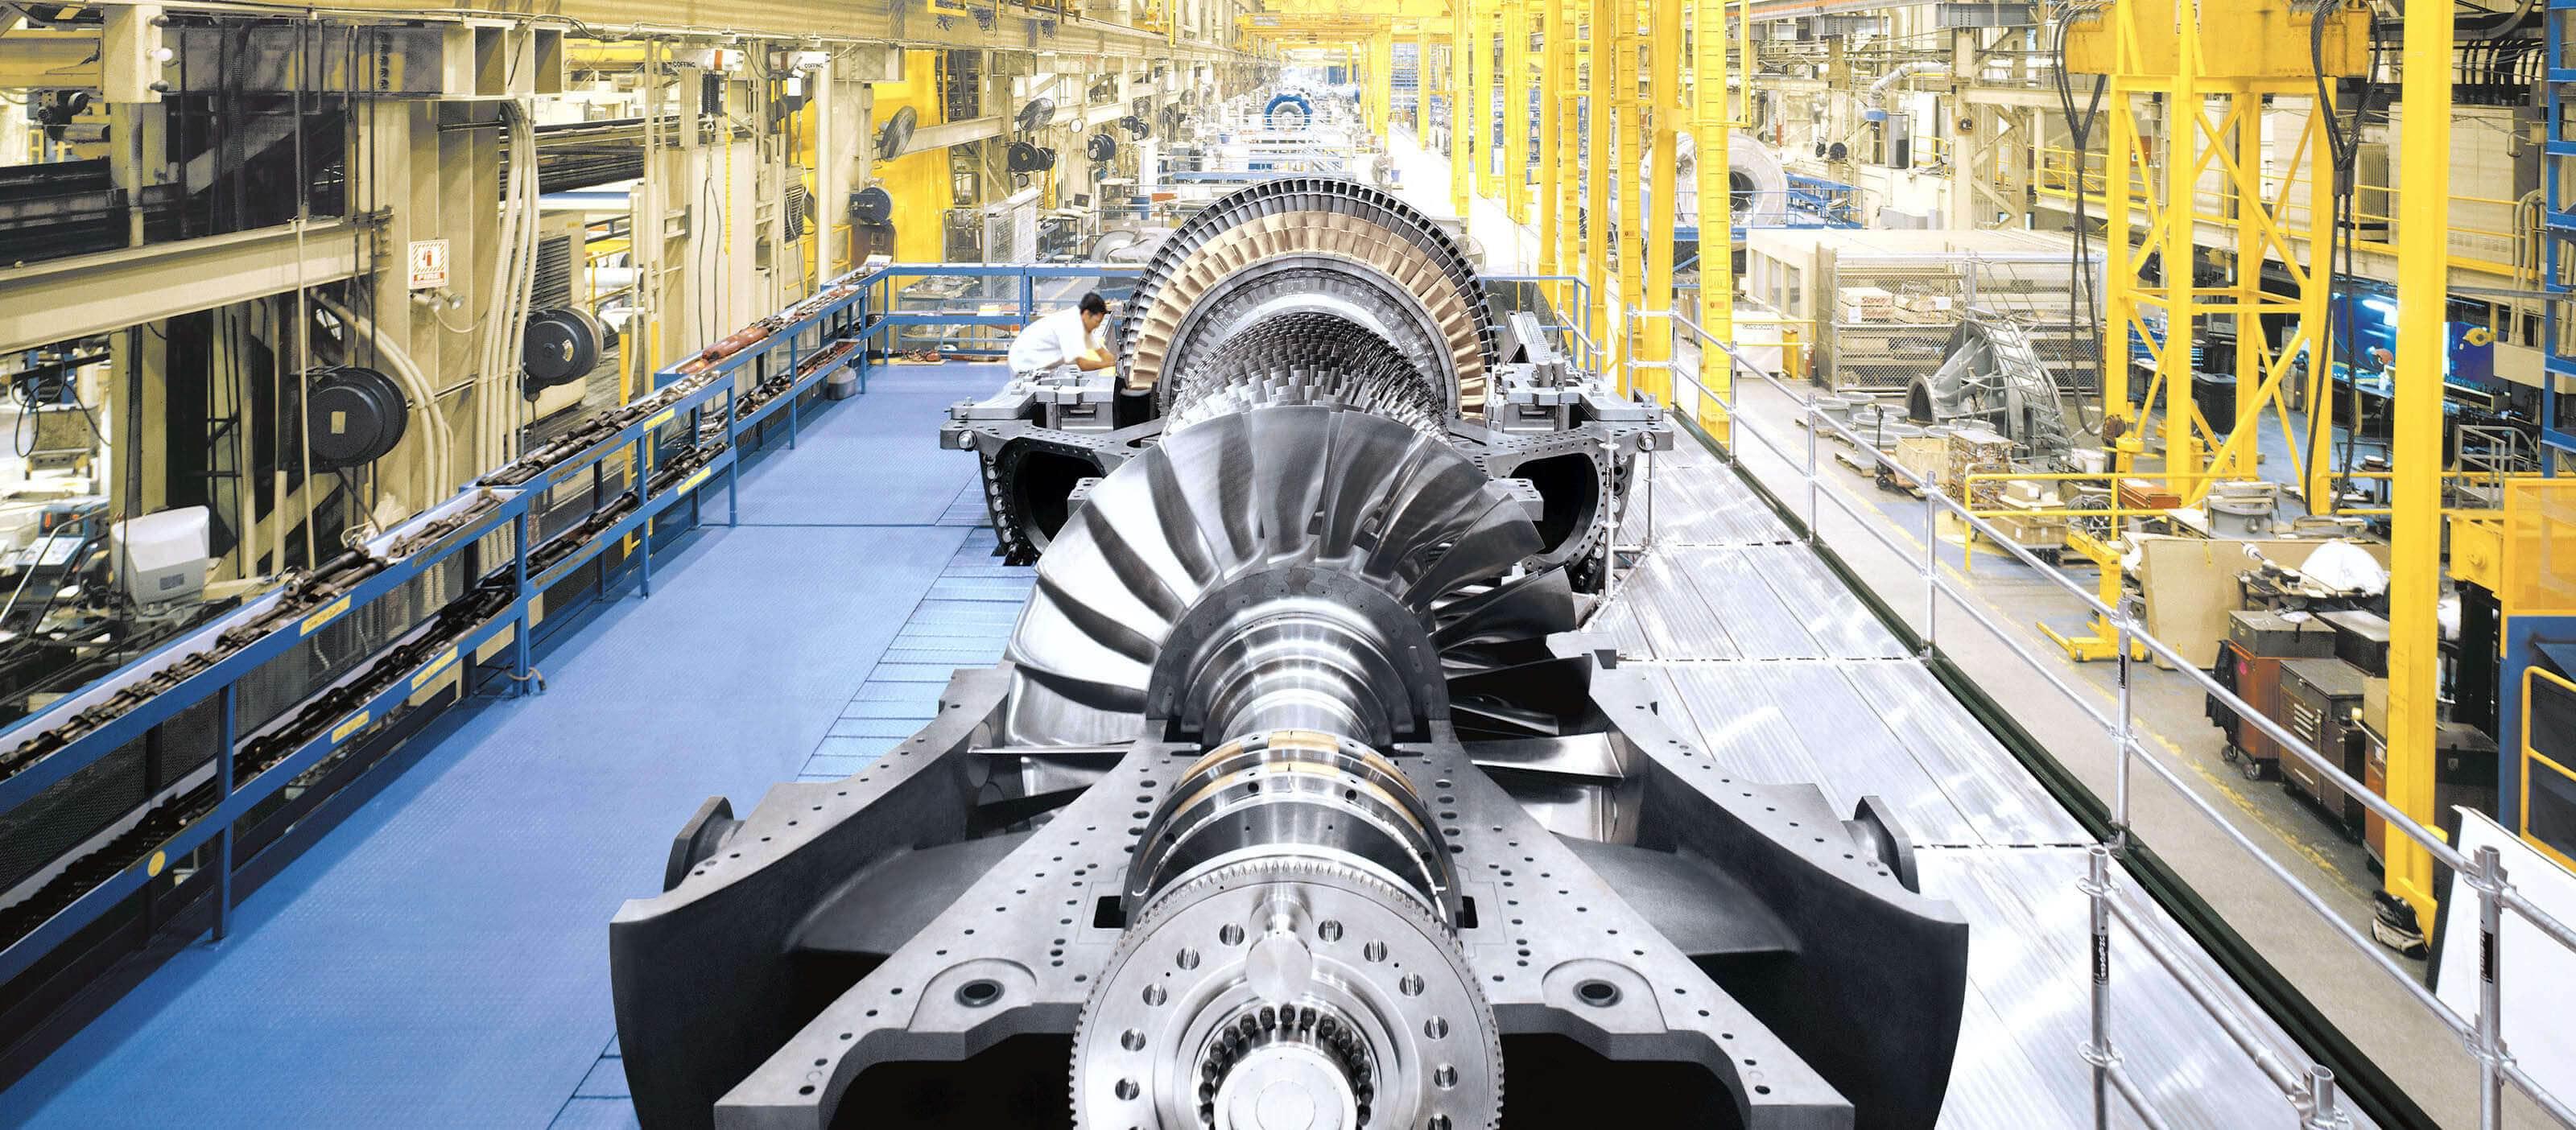 header-heavy-equipment-manufacturers-demo3200x1404header-heavy-equipment-manufacturers-demo3200x1404